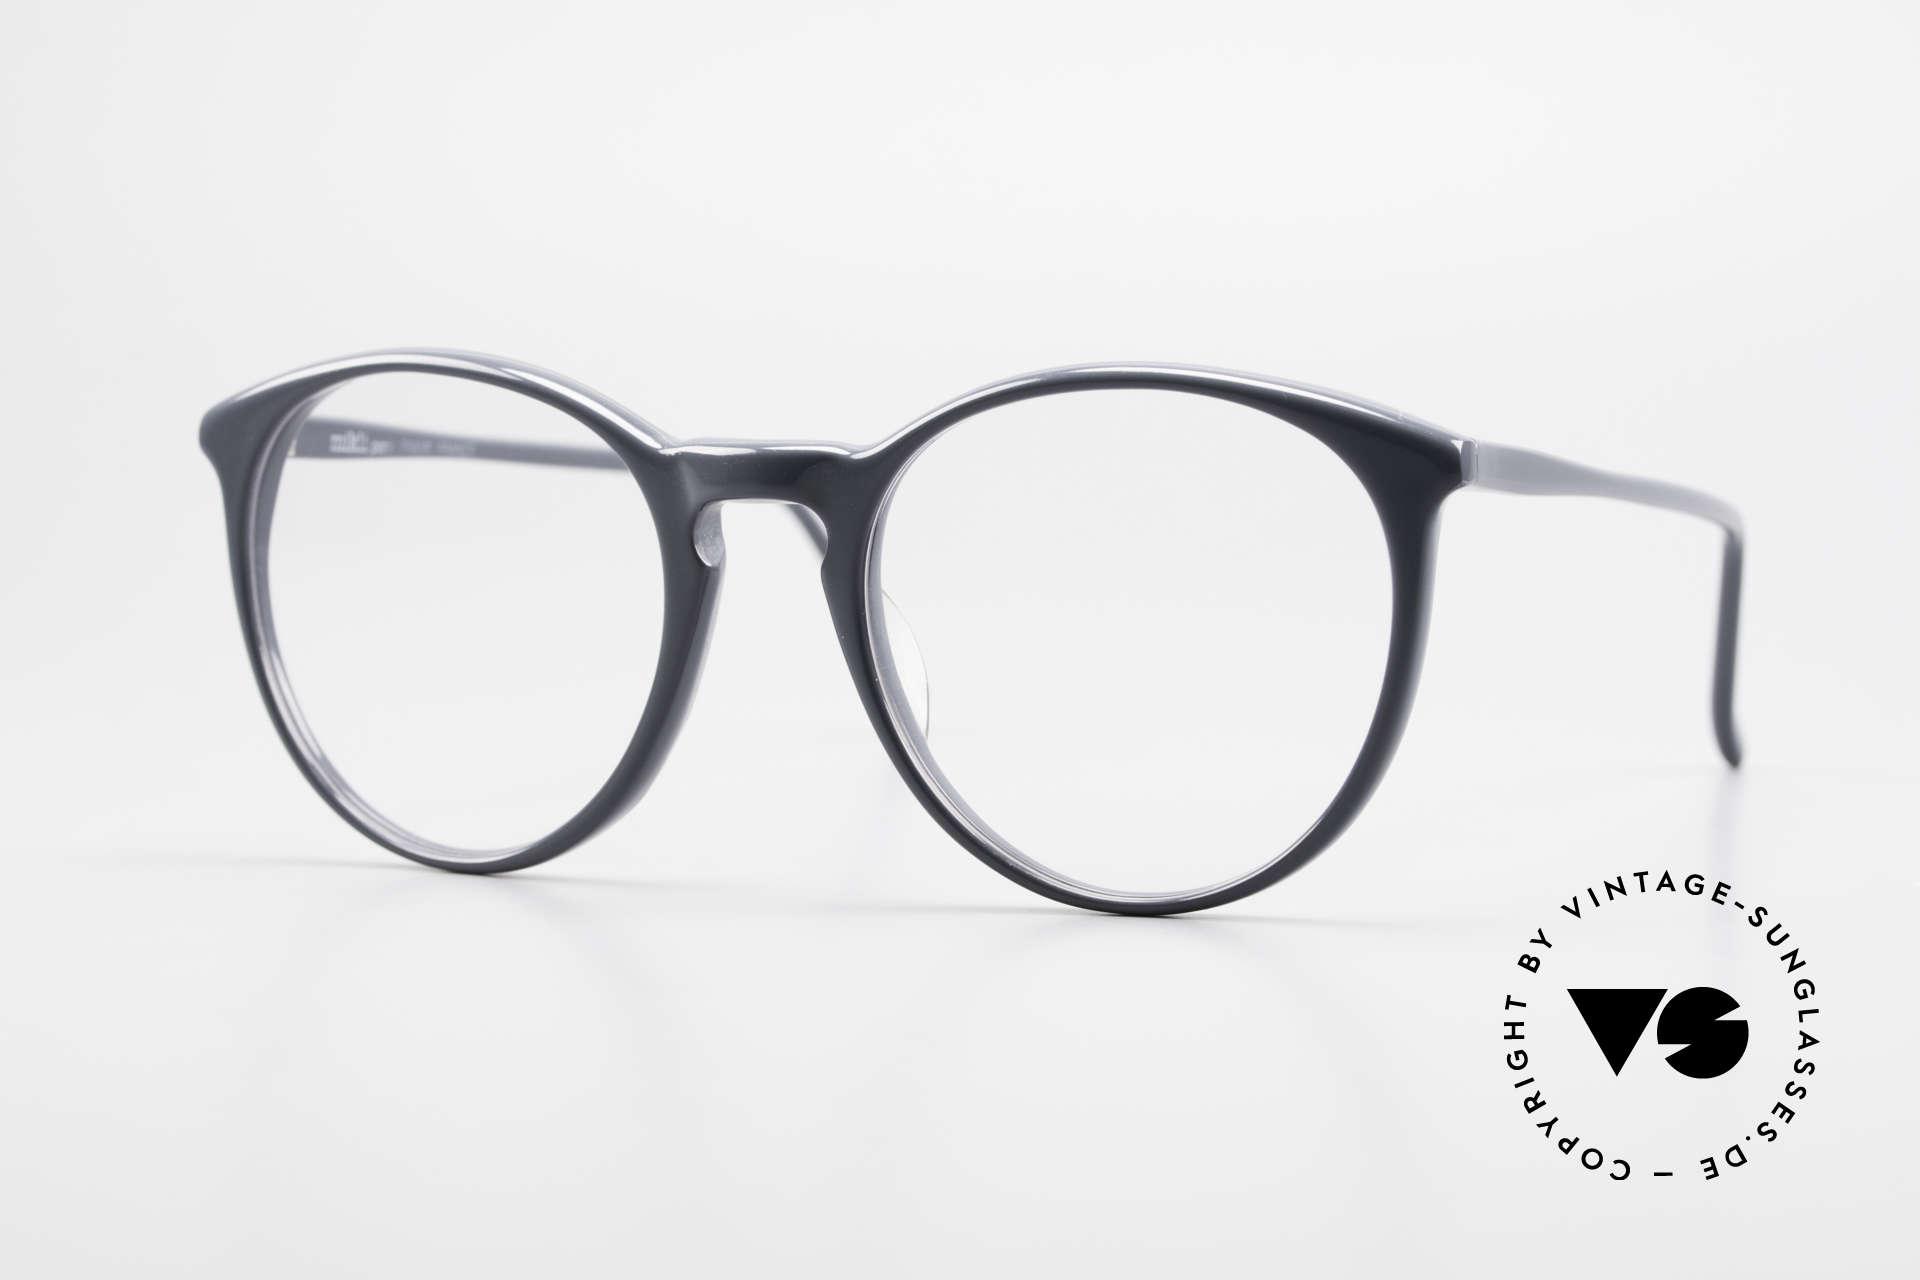 Alain Mikli 901 / 075 No Retro Glasses True Vintage, elegant VINTAGE Alain Mikli designer eyeglasses, Made for Men and Women